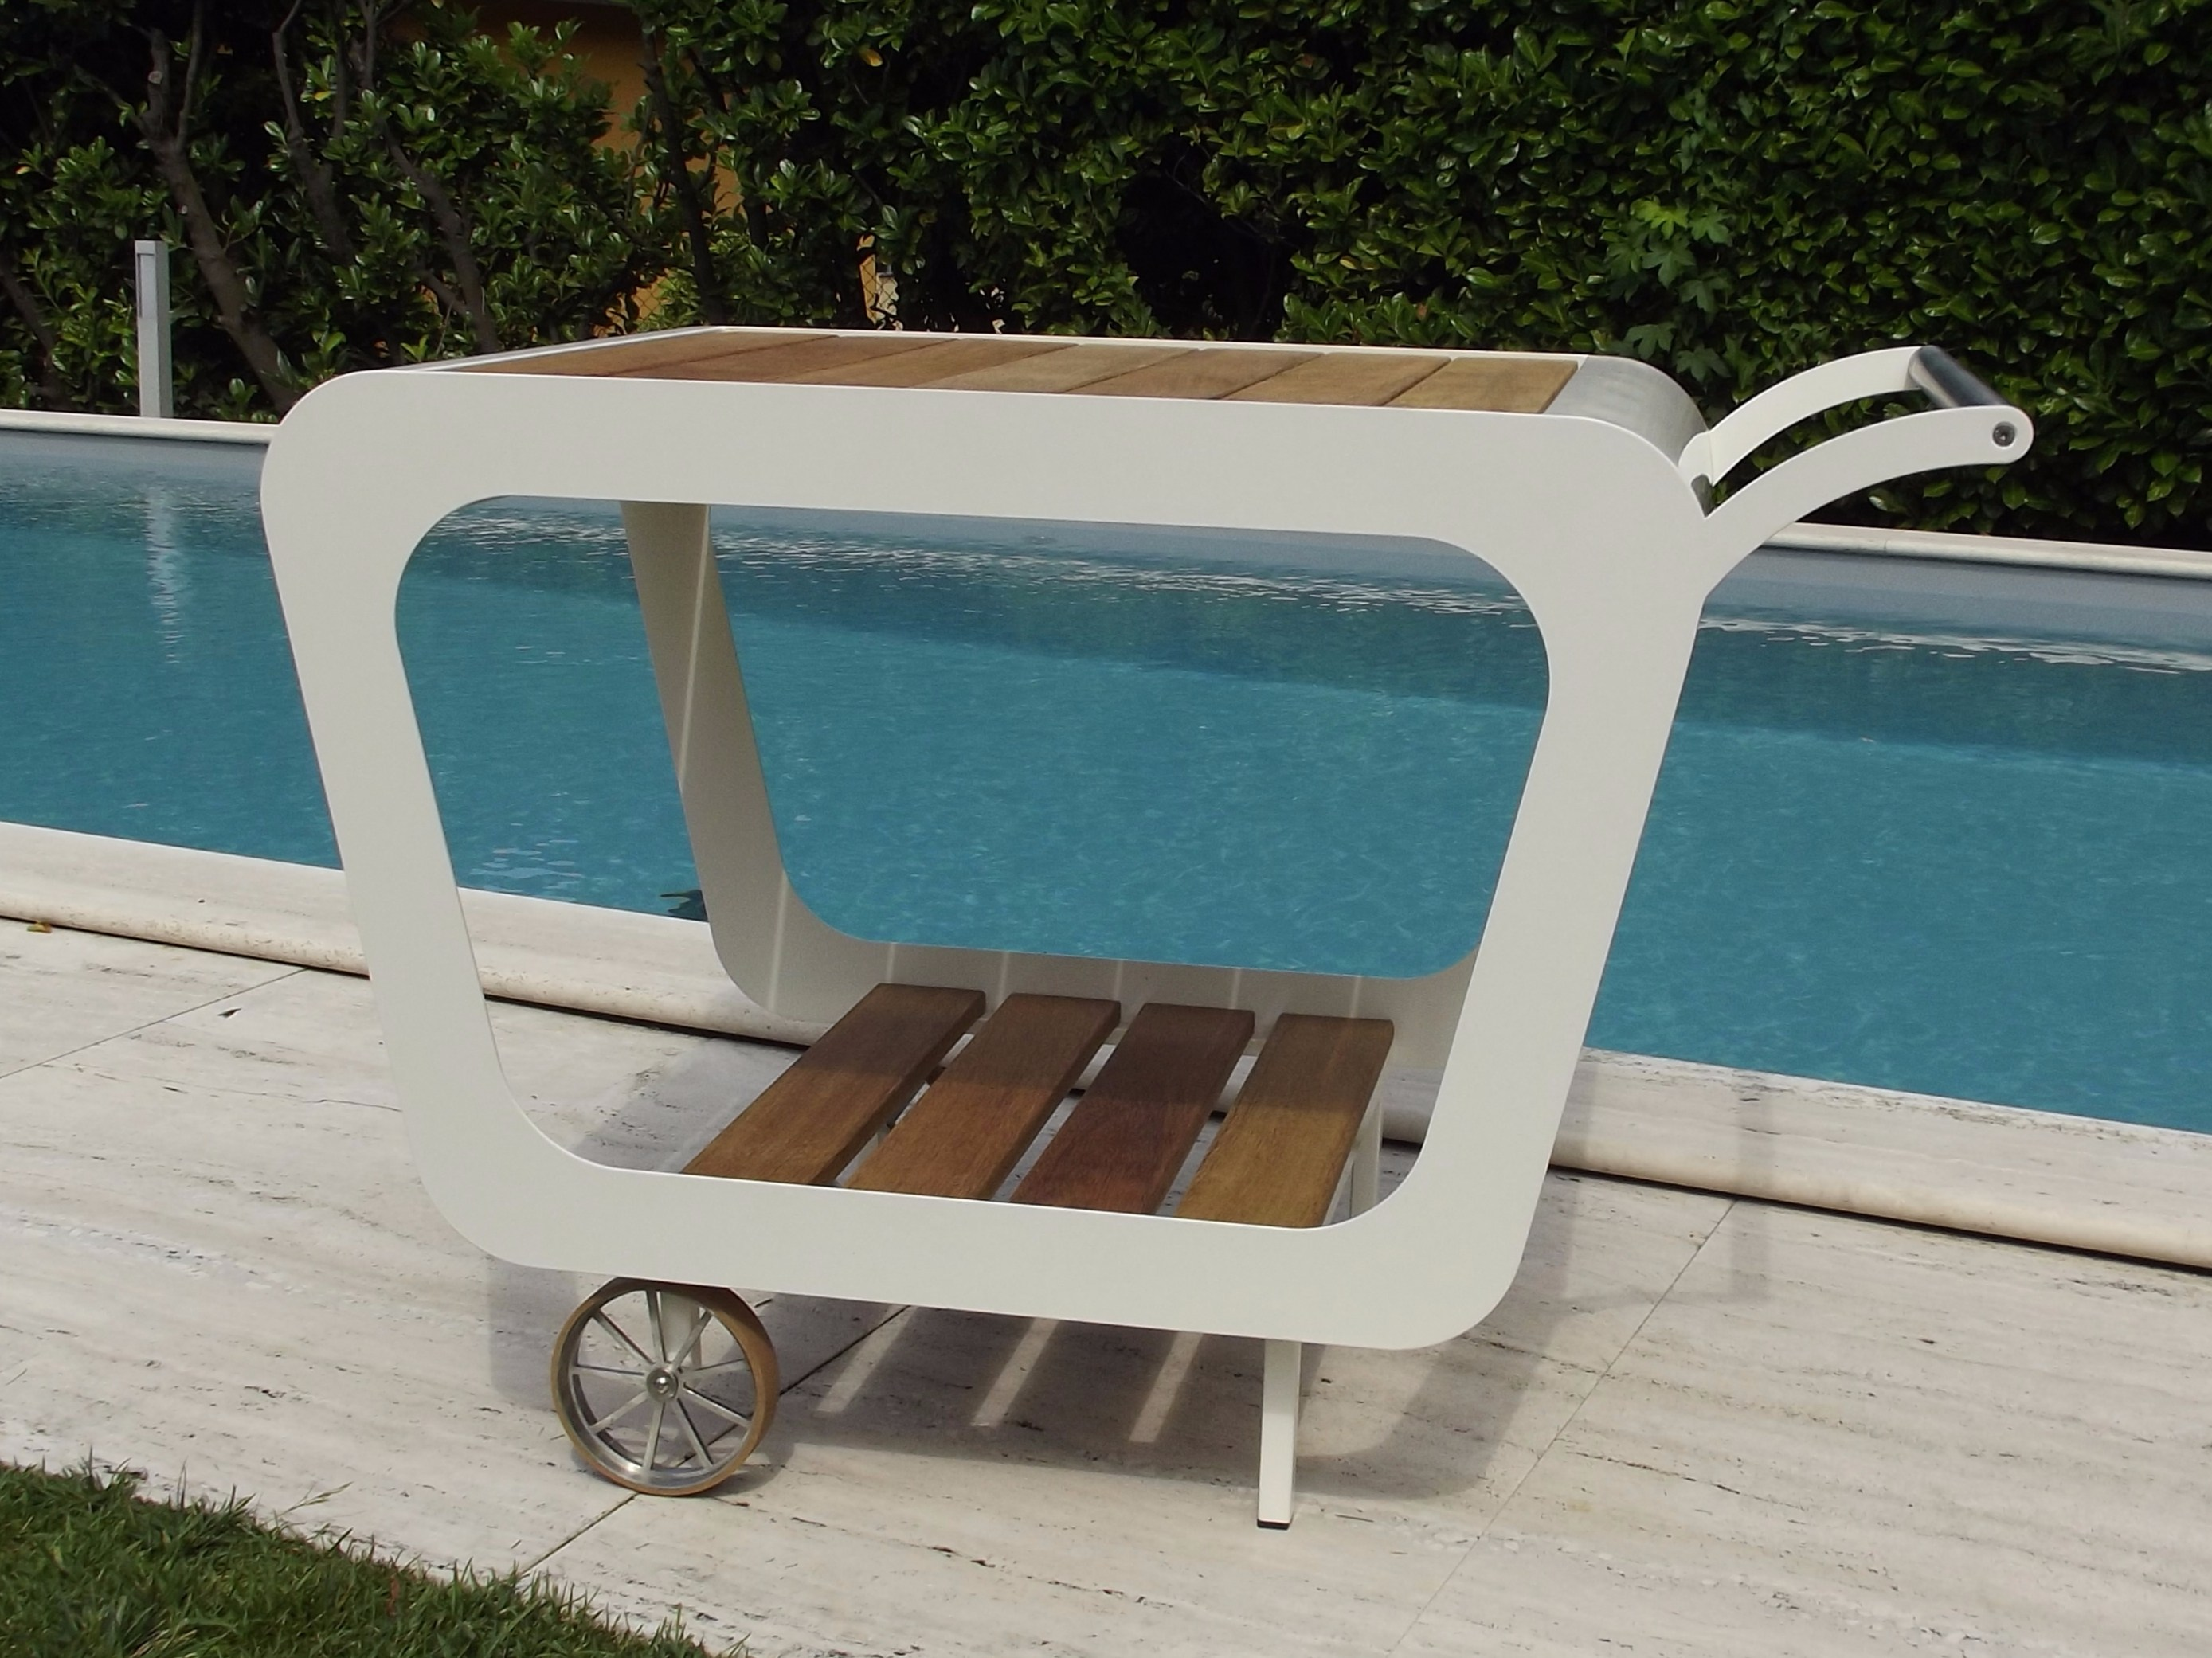 Carrello portavivande sun by lgtek outdoor design marcello - Carrello portavivande design ...